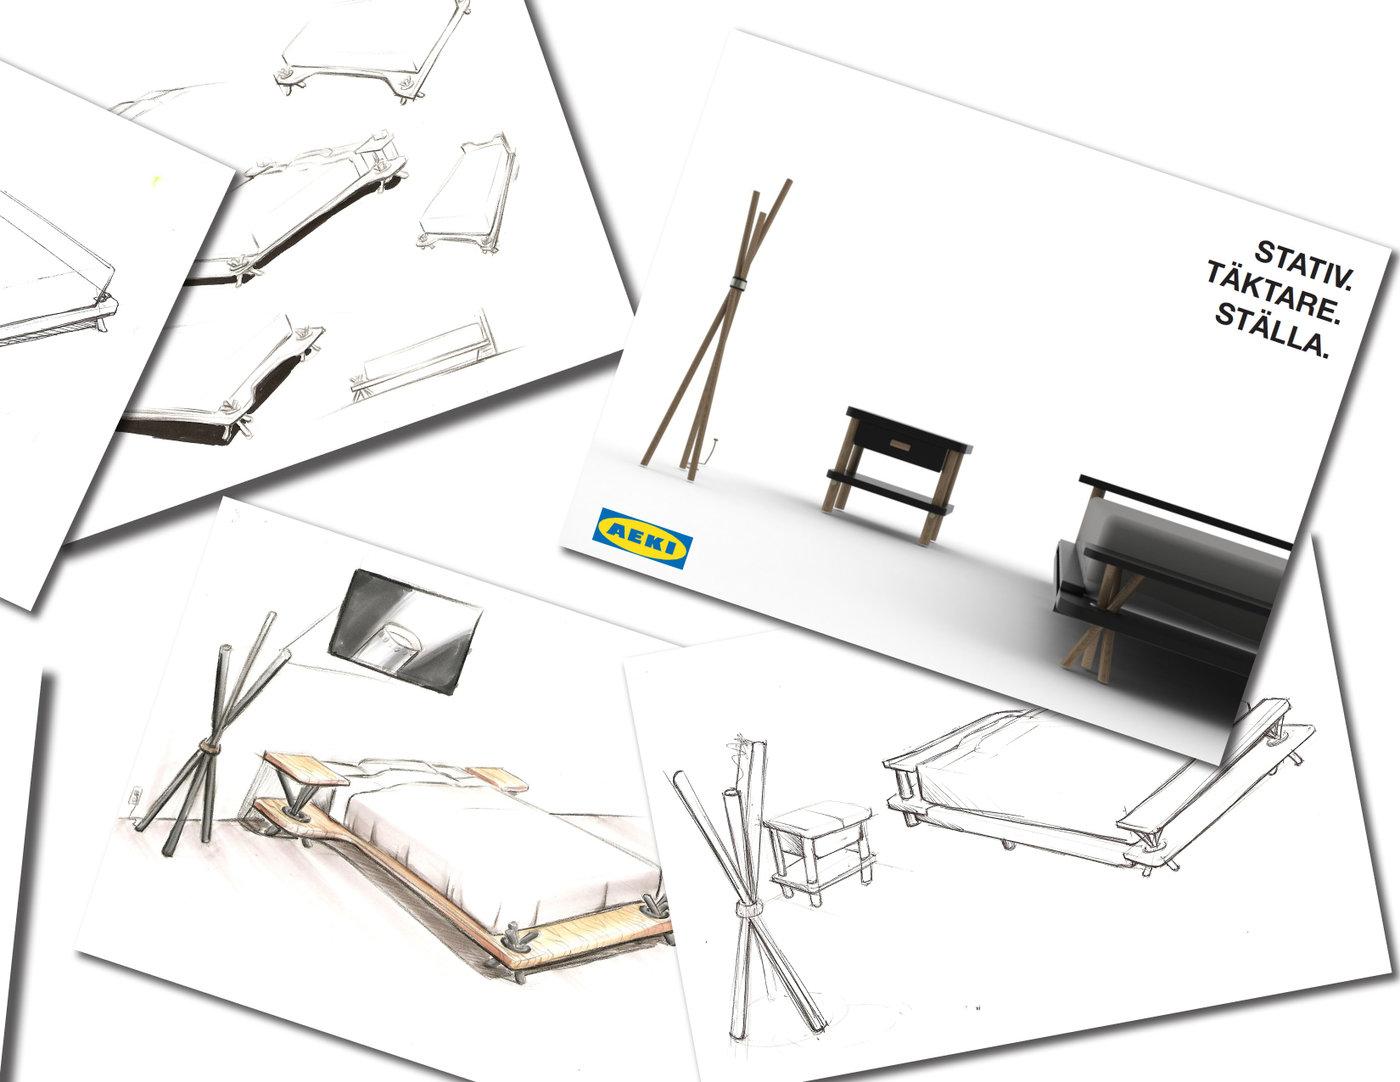 Aeki Furniture Design by Cesar Viramontes at Coroflot.com